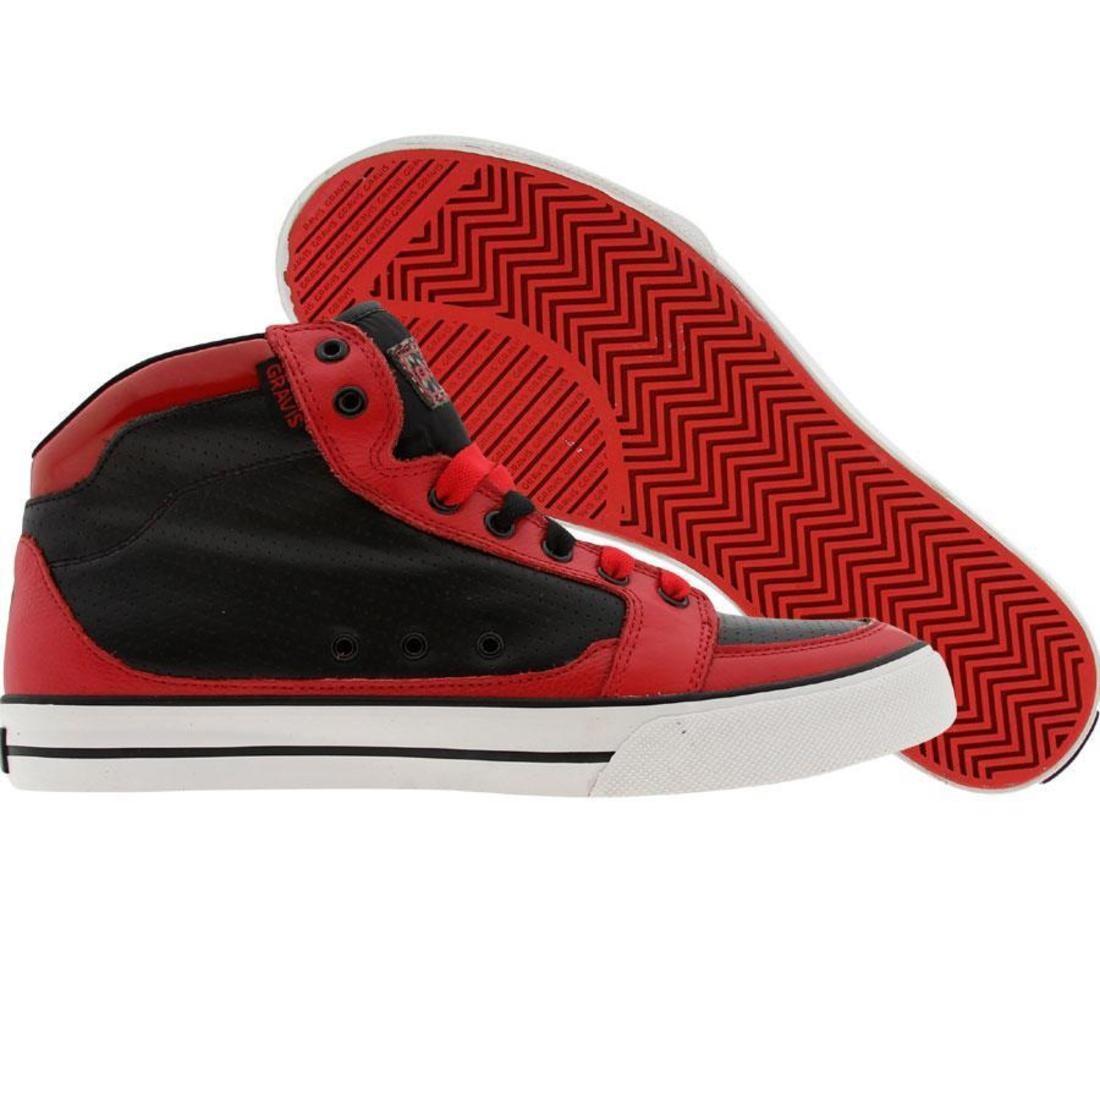 【海外限定】靴 スニーカー 【 GRAVIS LOWDOWN HC LX BLACK RED 】